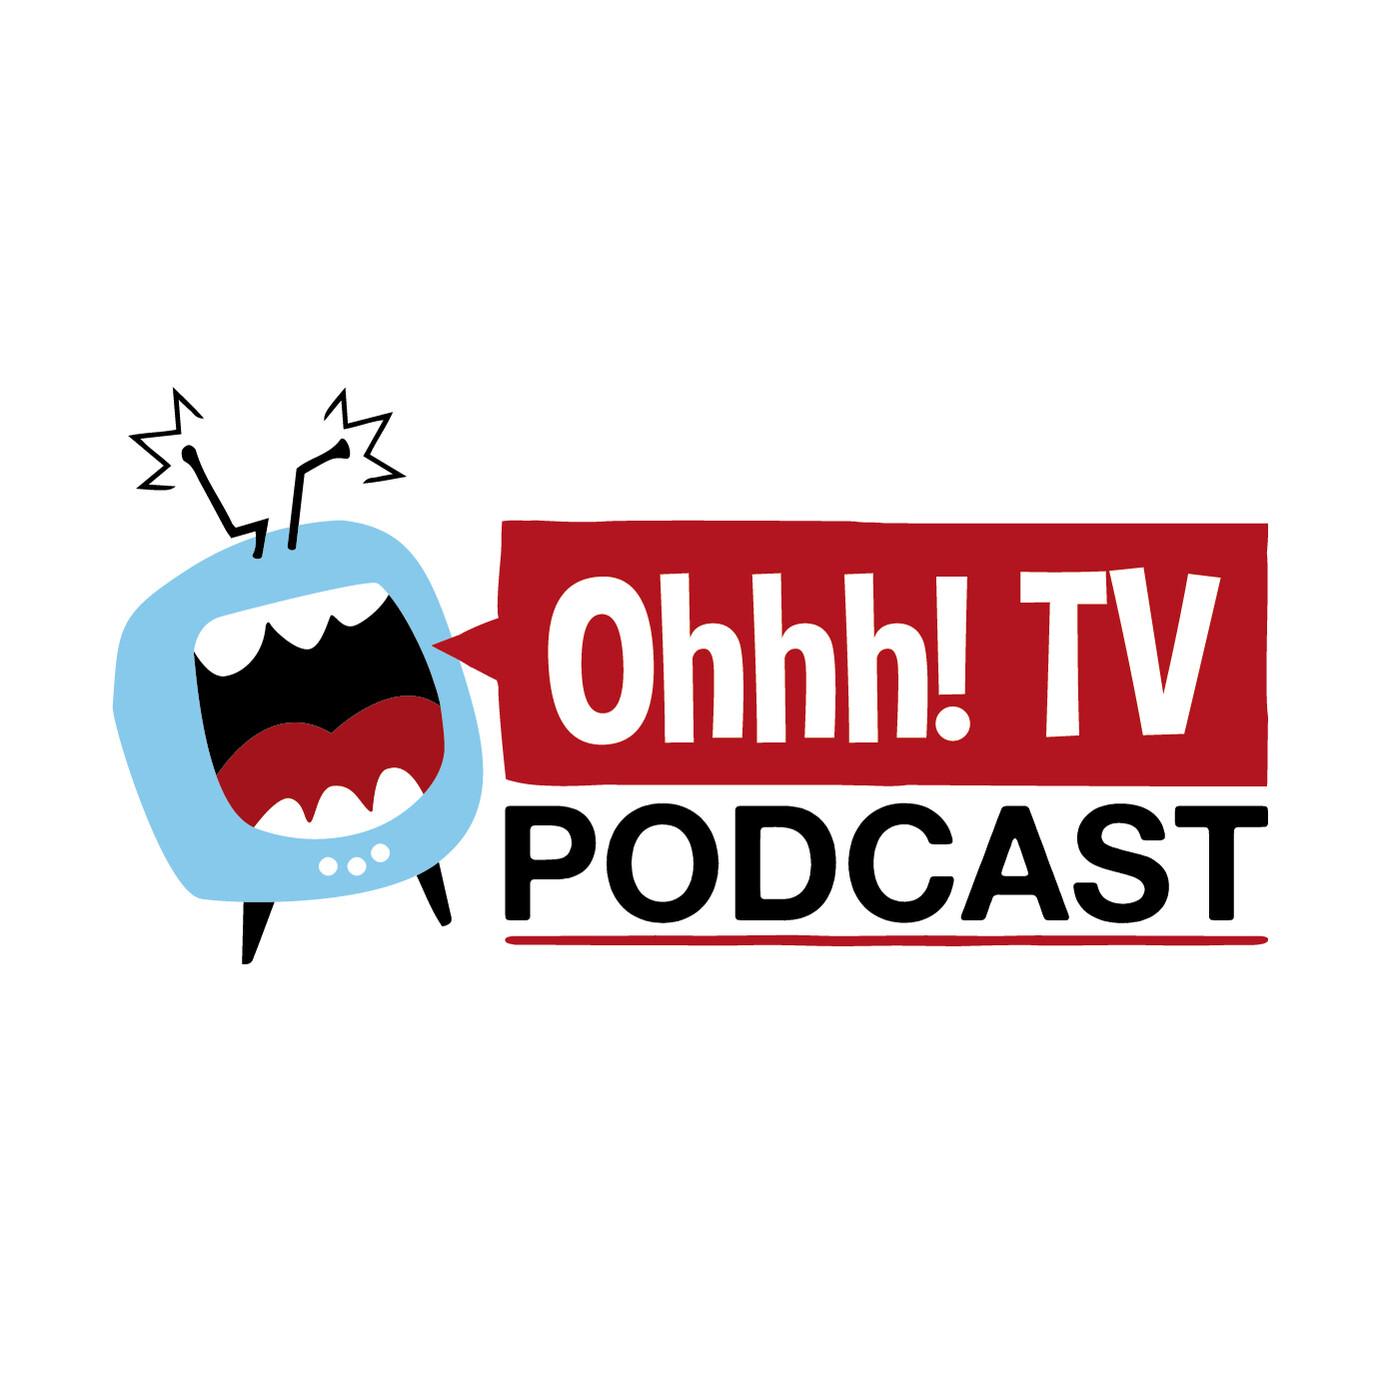 Ohhh! TV Podcast - ohhhtv